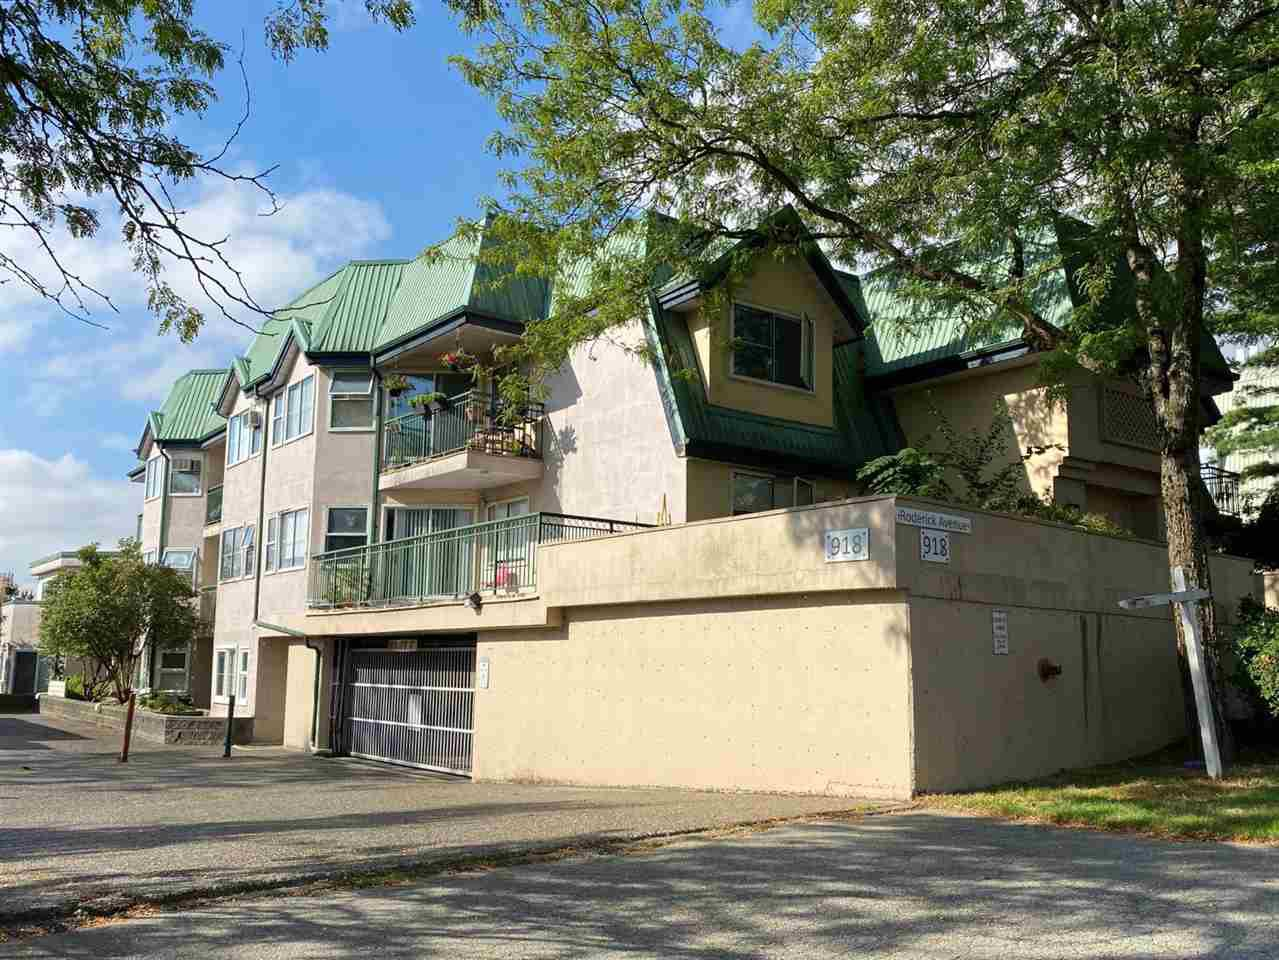 Main Photo: 205 918 RODERICK Avenue in Coquitlam: Maillardville Condo for sale : MLS®# R2501500